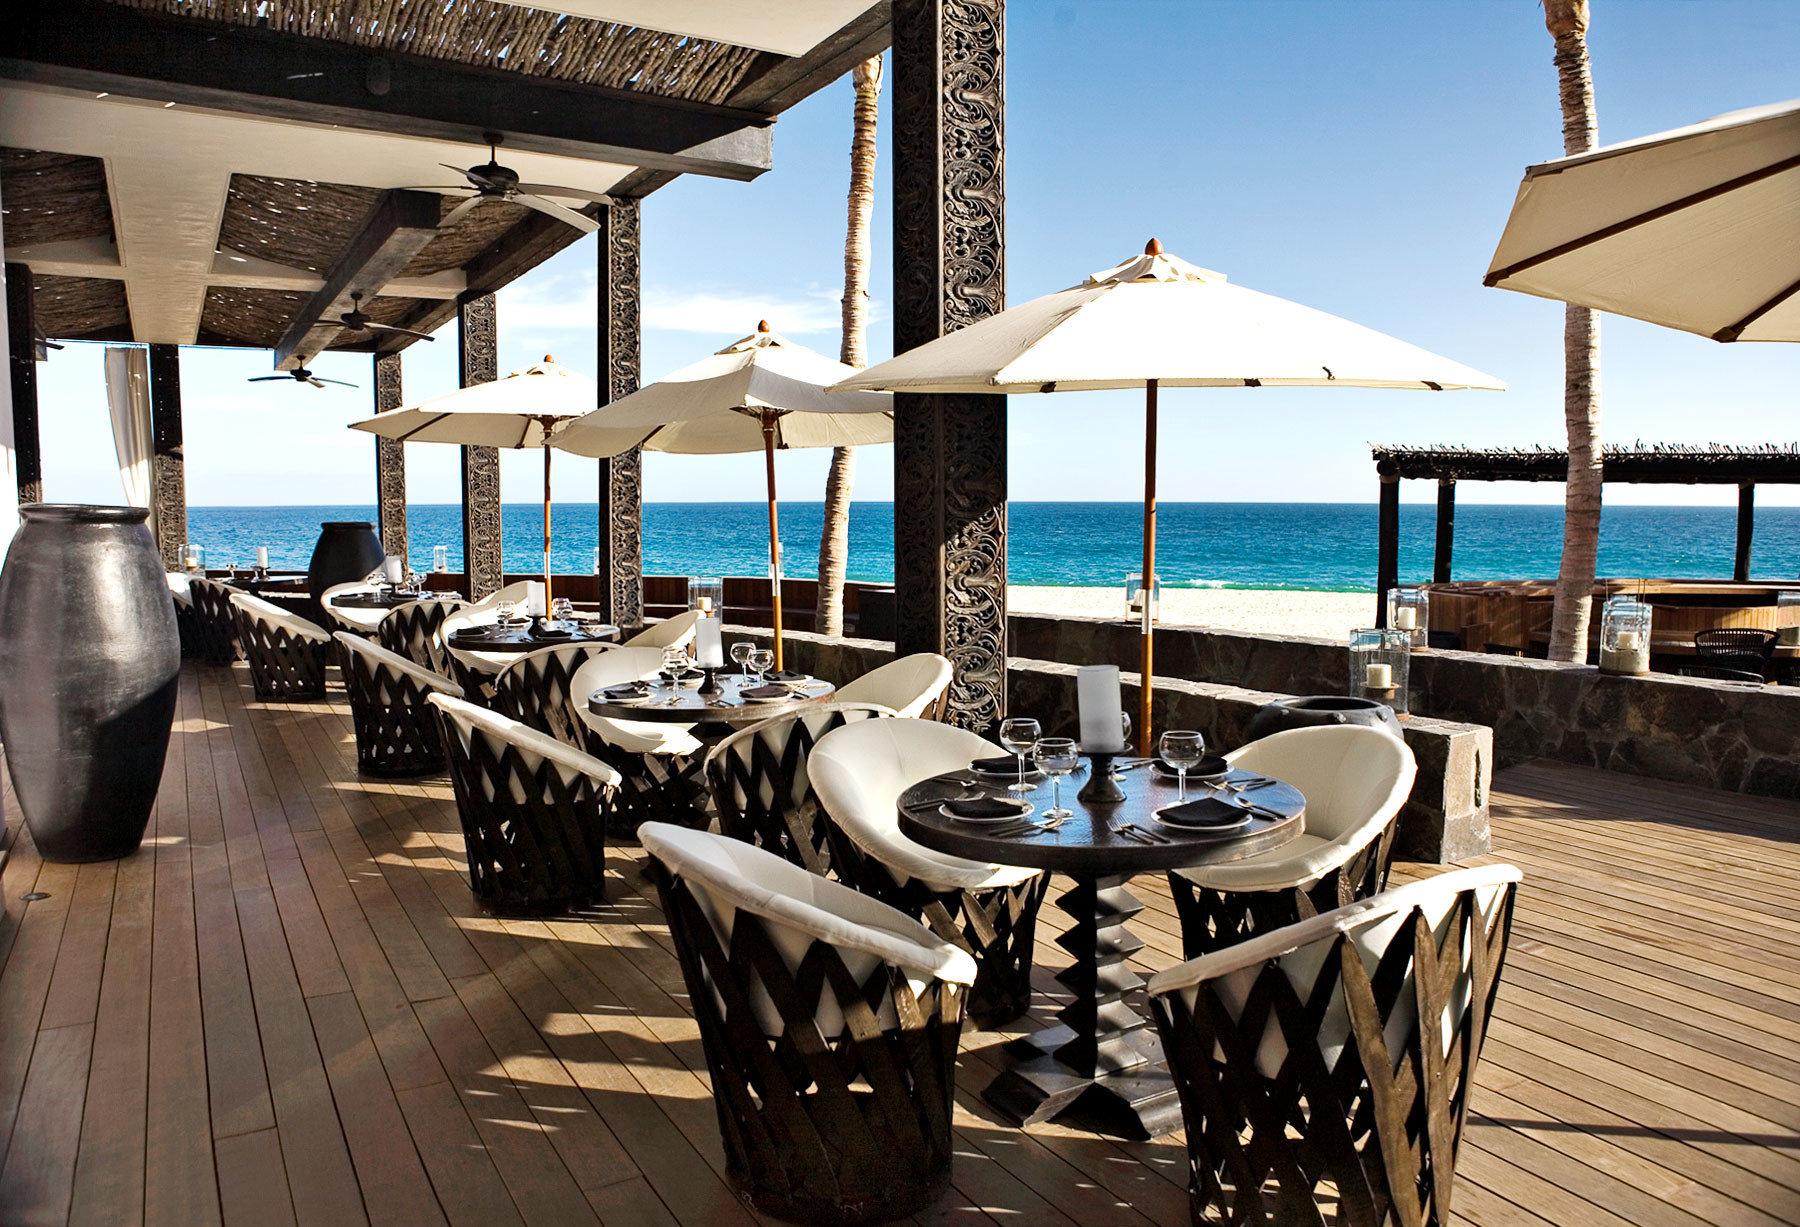 Bar Beach Beachfront Deck Dining Drink Eat chair Resort vehicle dock restaurant marina yacht lined